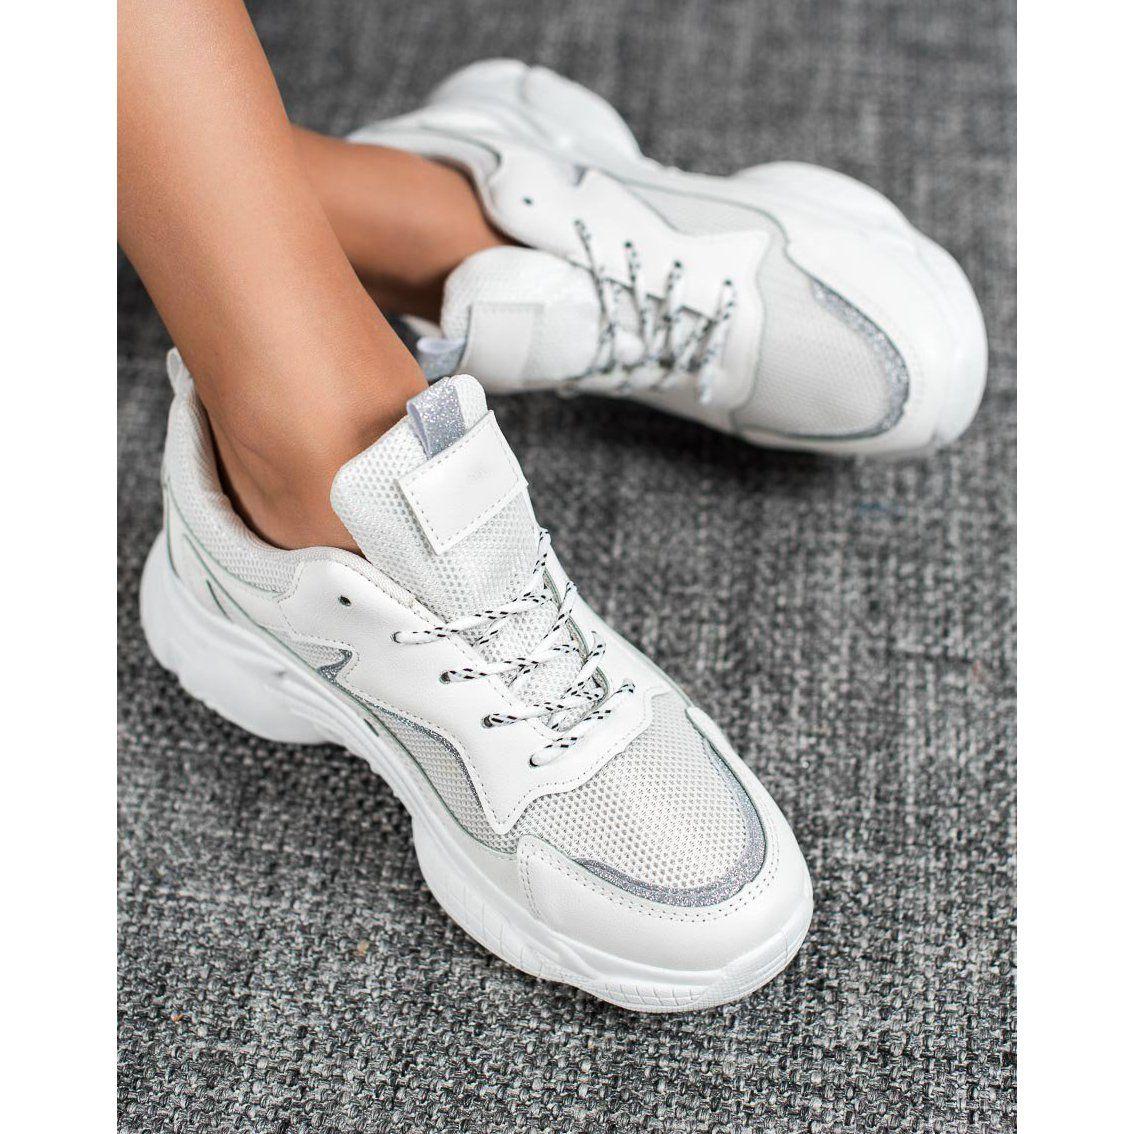 Shelovet Classic Sport Shoes White Plastic Heels Sports Footwear Sport Shoes